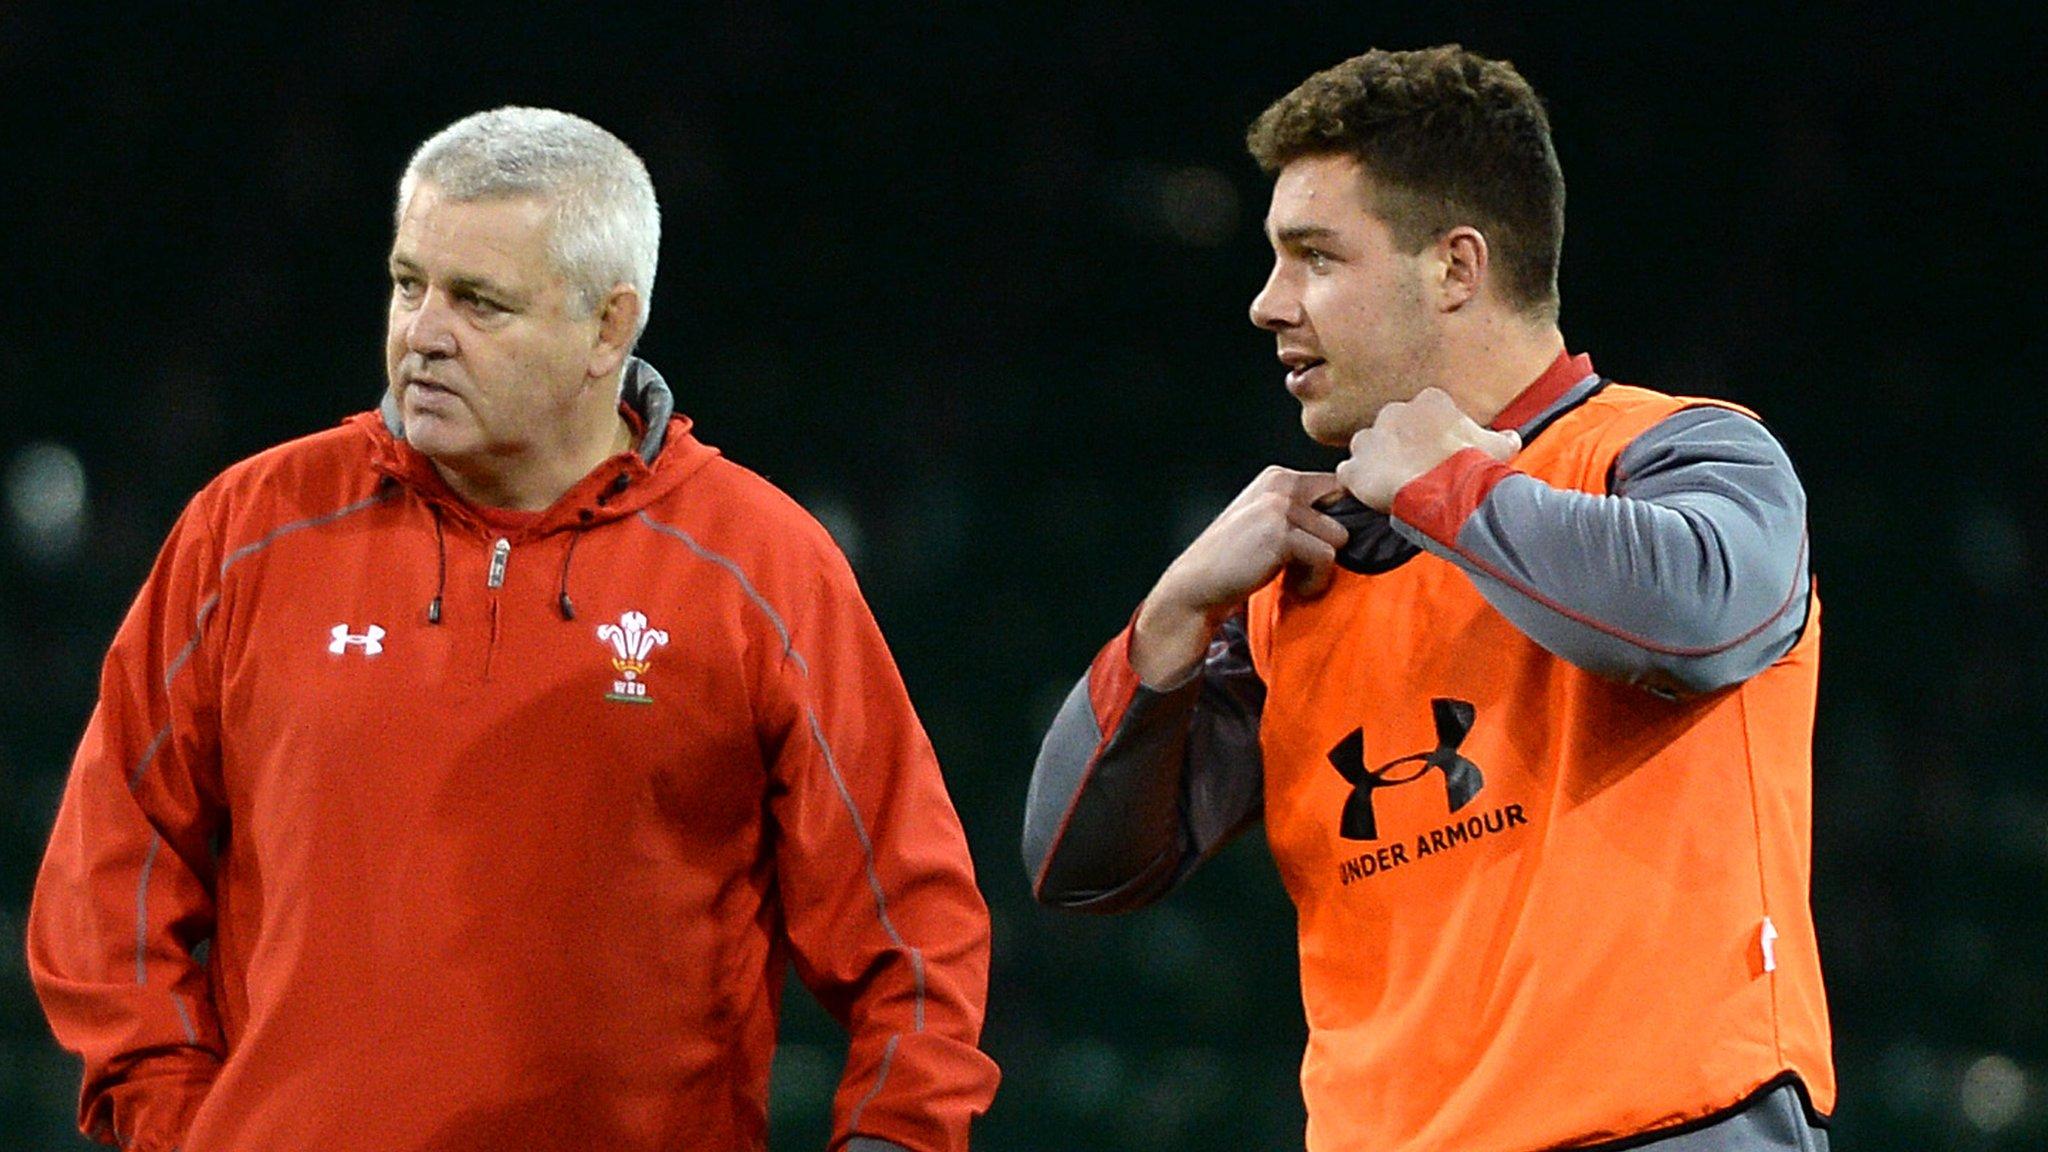 Gatland hopes for 'common sense' over Webb's Wales eligibility